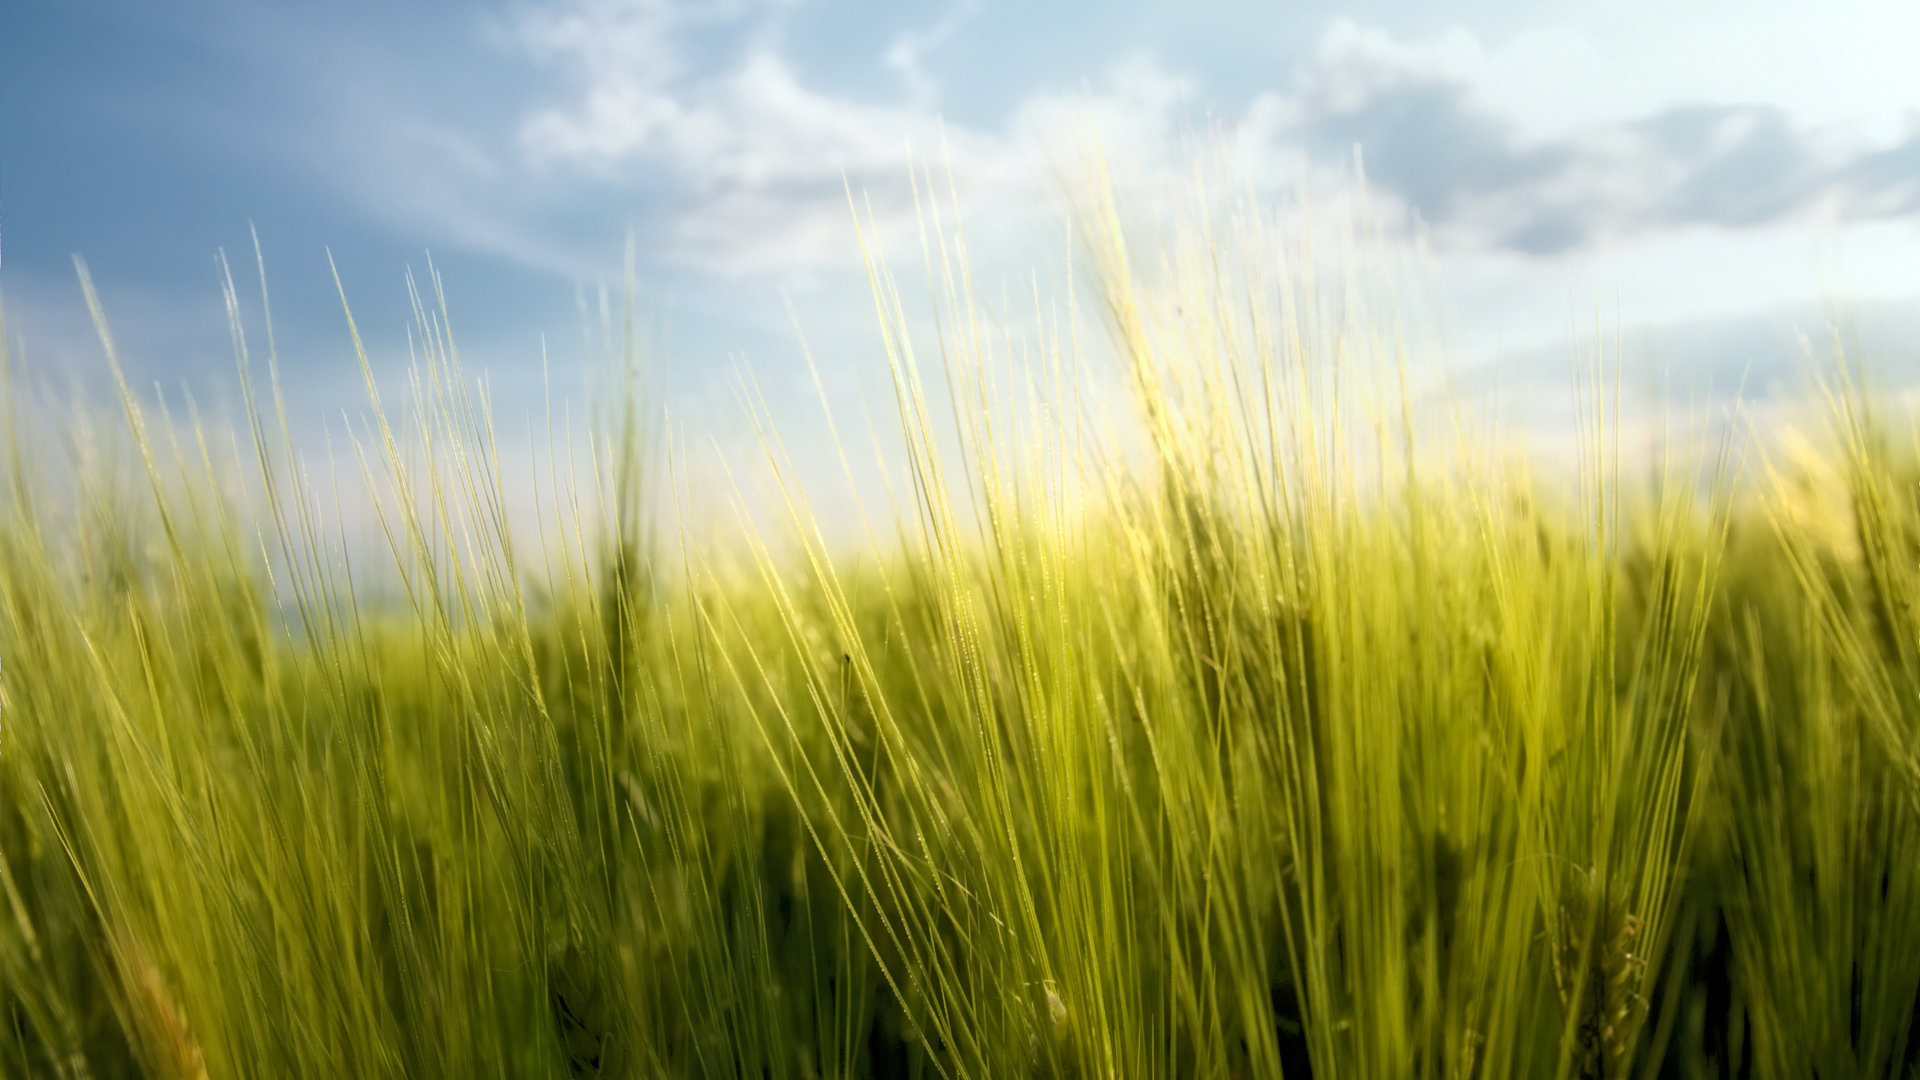 High Resolution Grass Full Hd 1080p Wallpaper Id 378159 For Computer